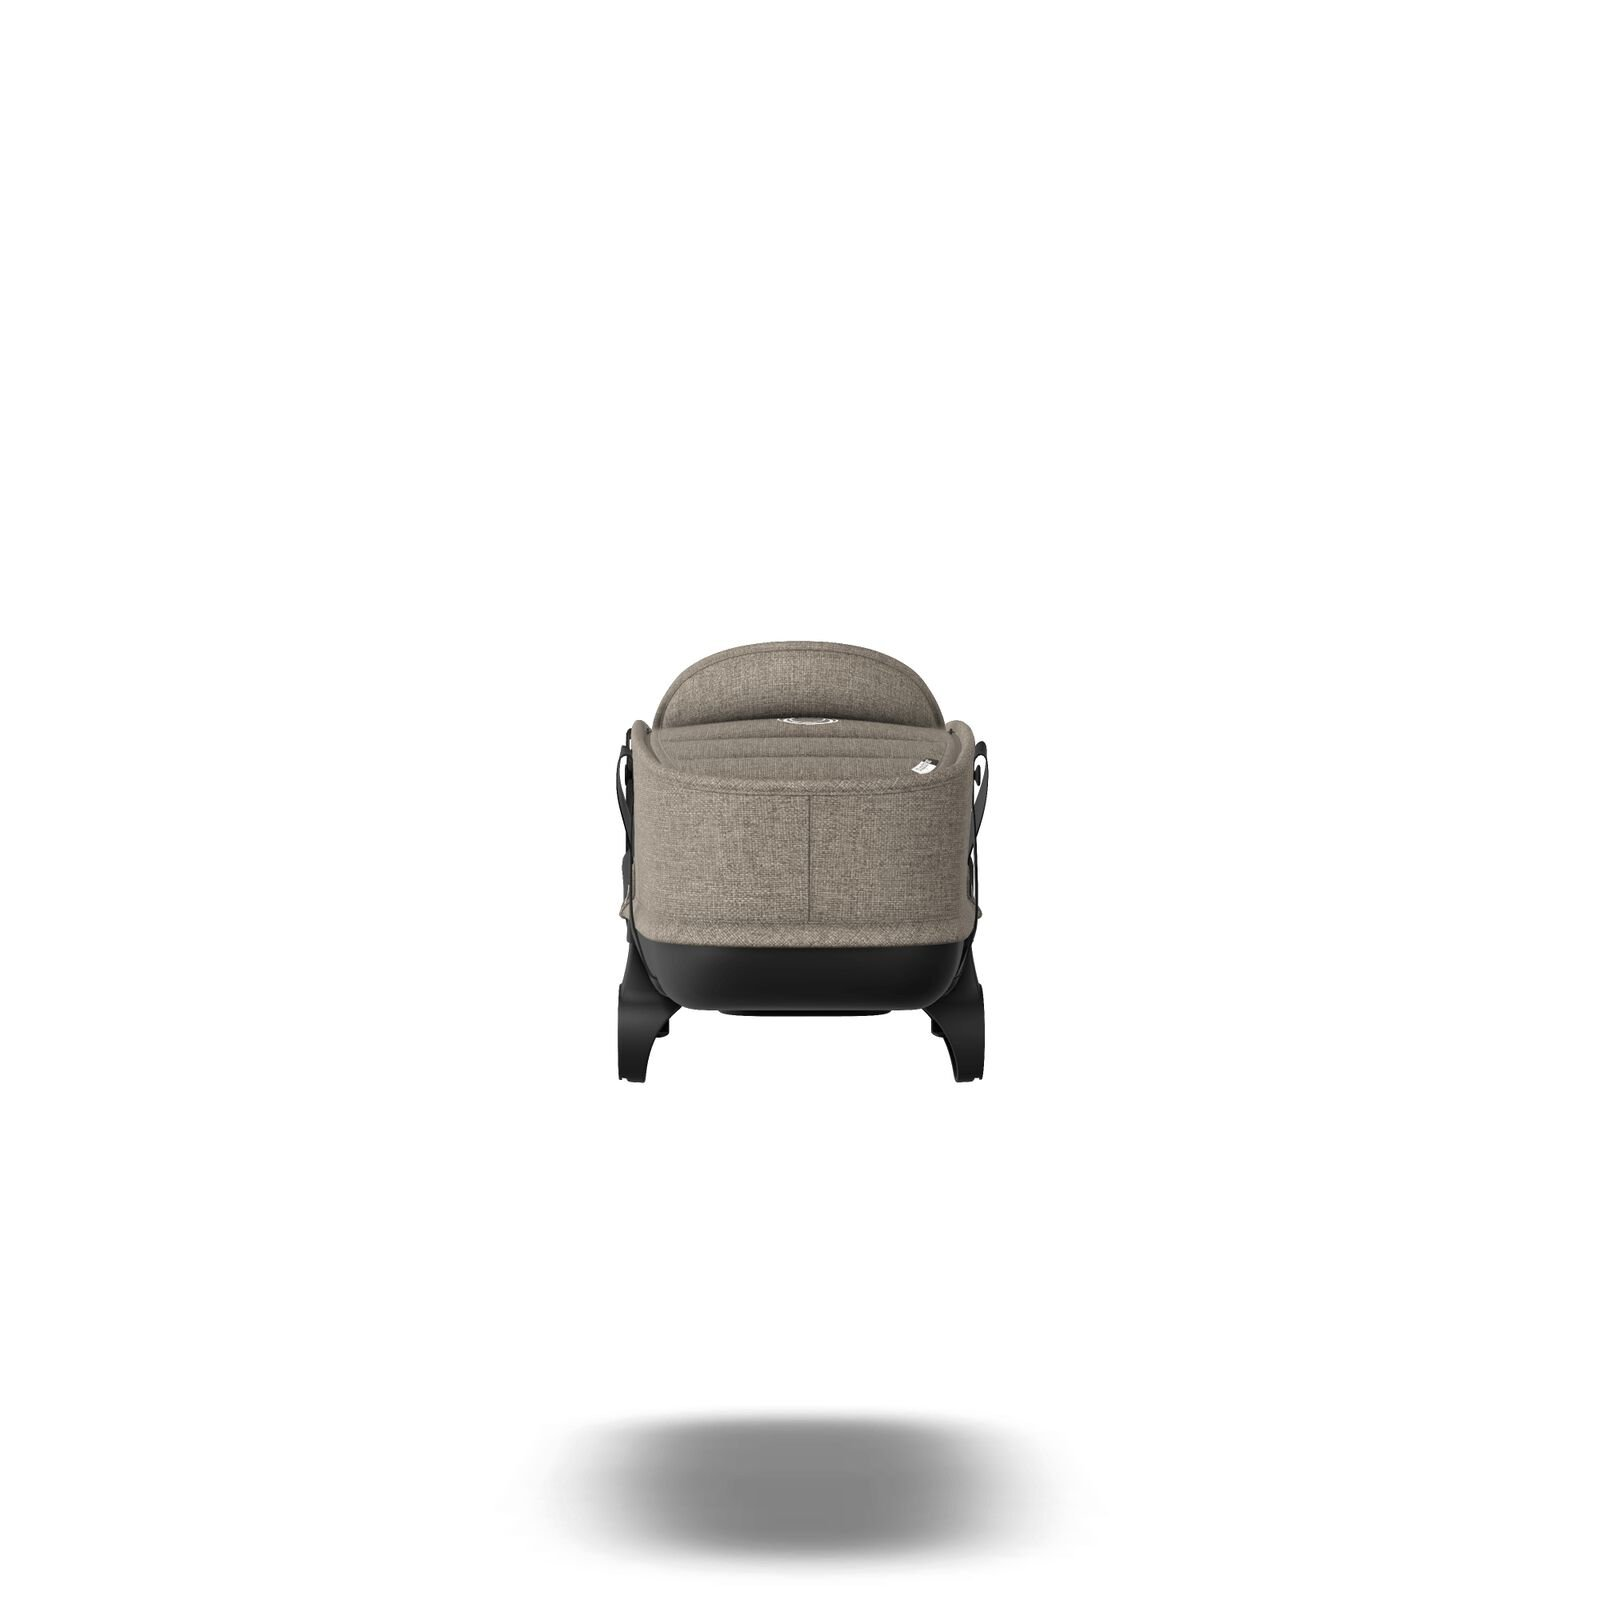 Bugaboo Bee 5 bassinet tailored fabric set